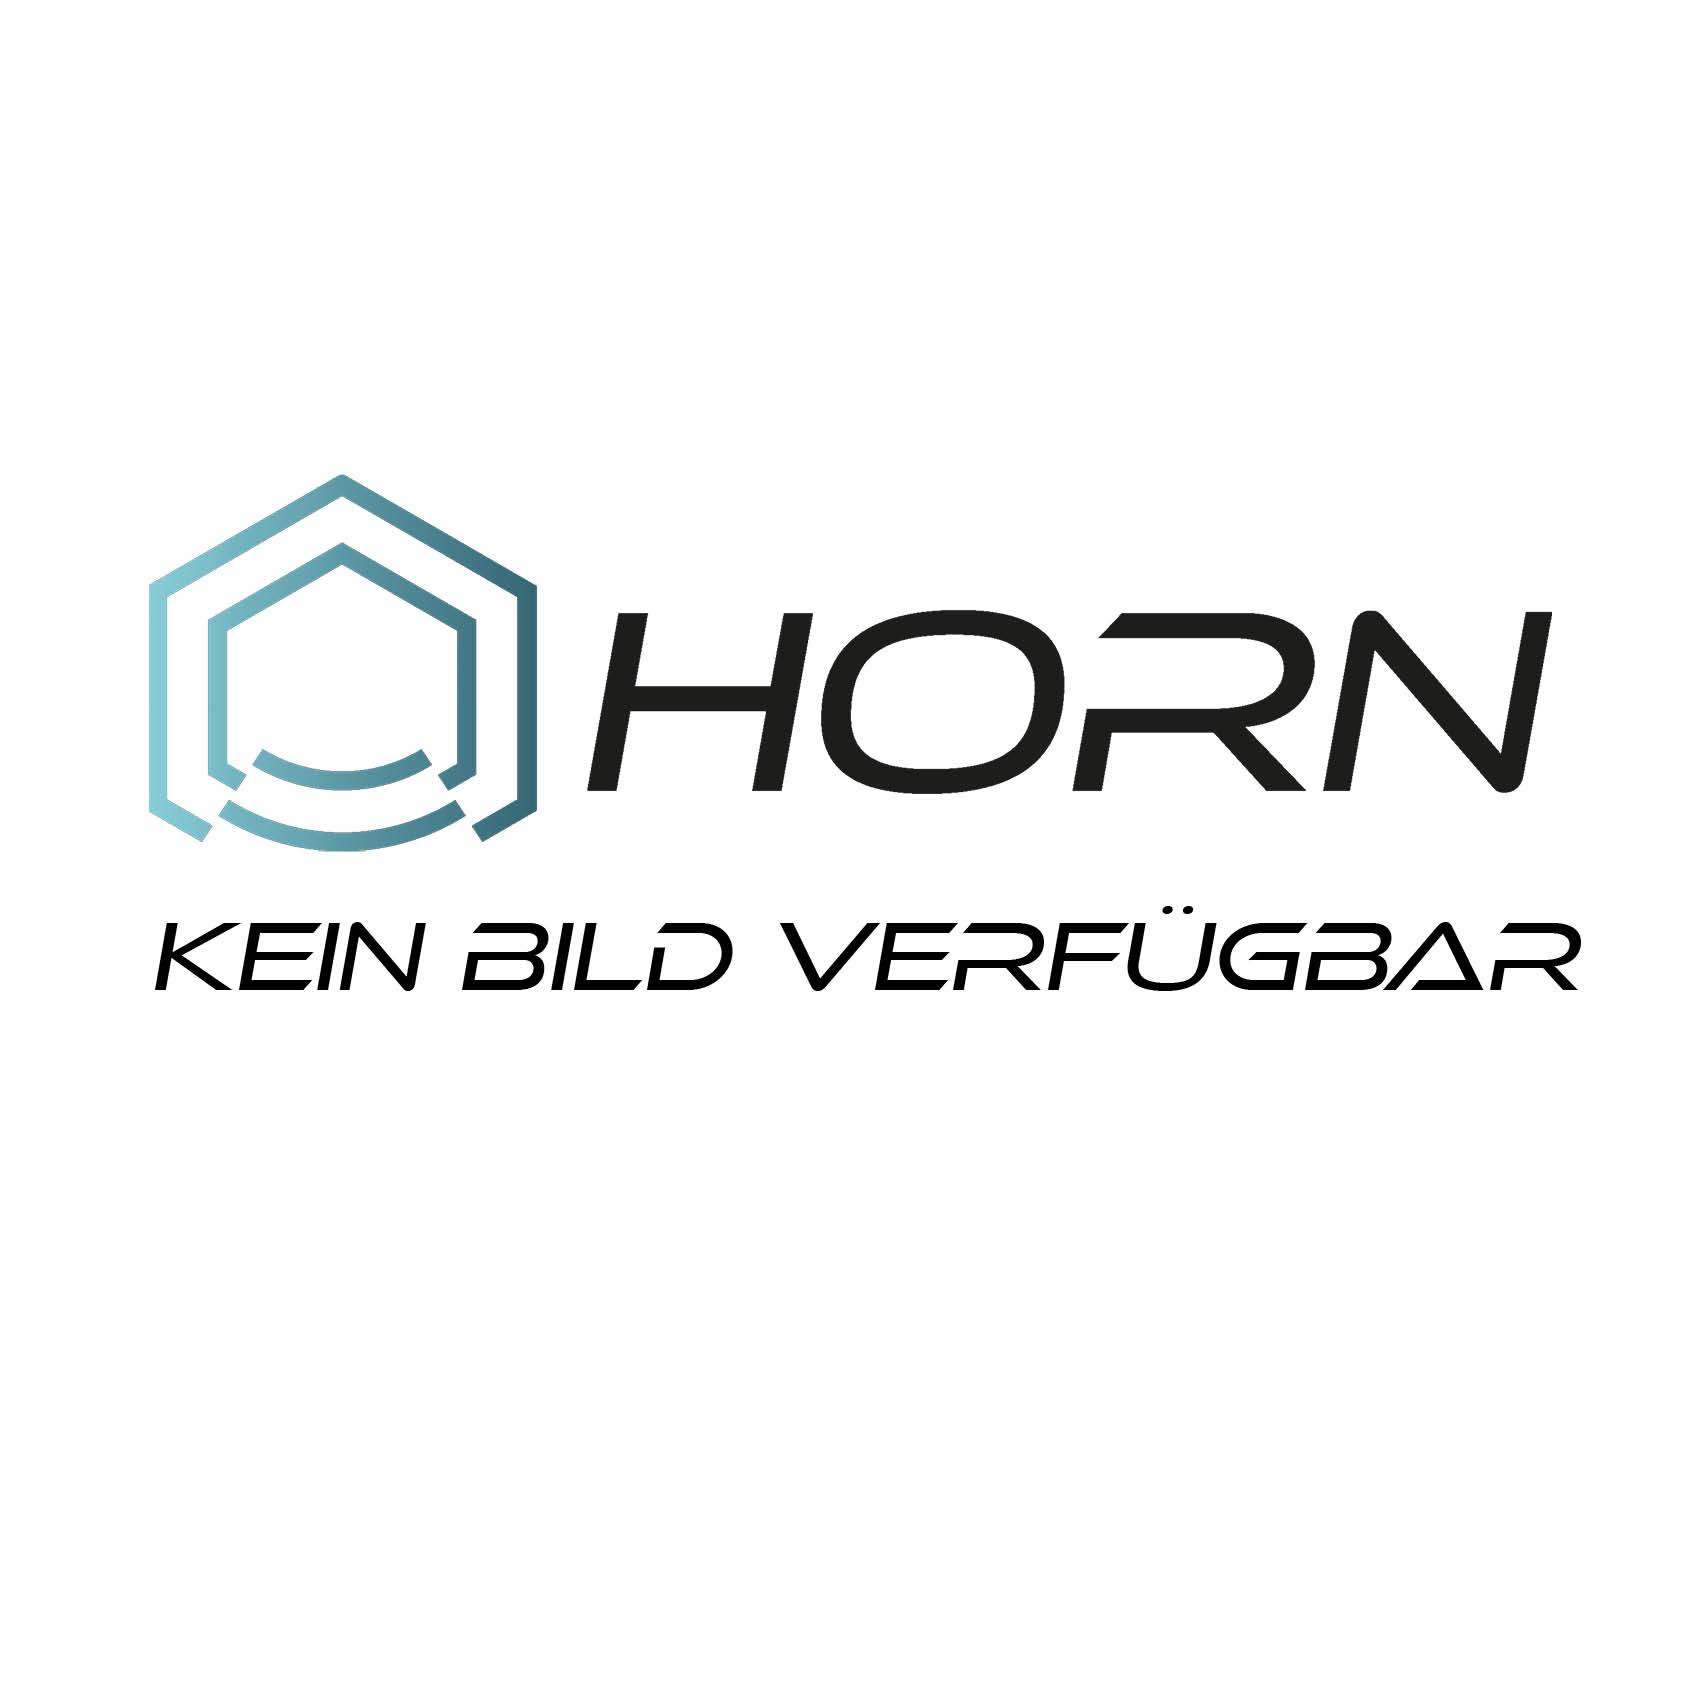 horn online hoppe sto griff e5012 1300 1800x30mm. Black Bedroom Furniture Sets. Home Design Ideas